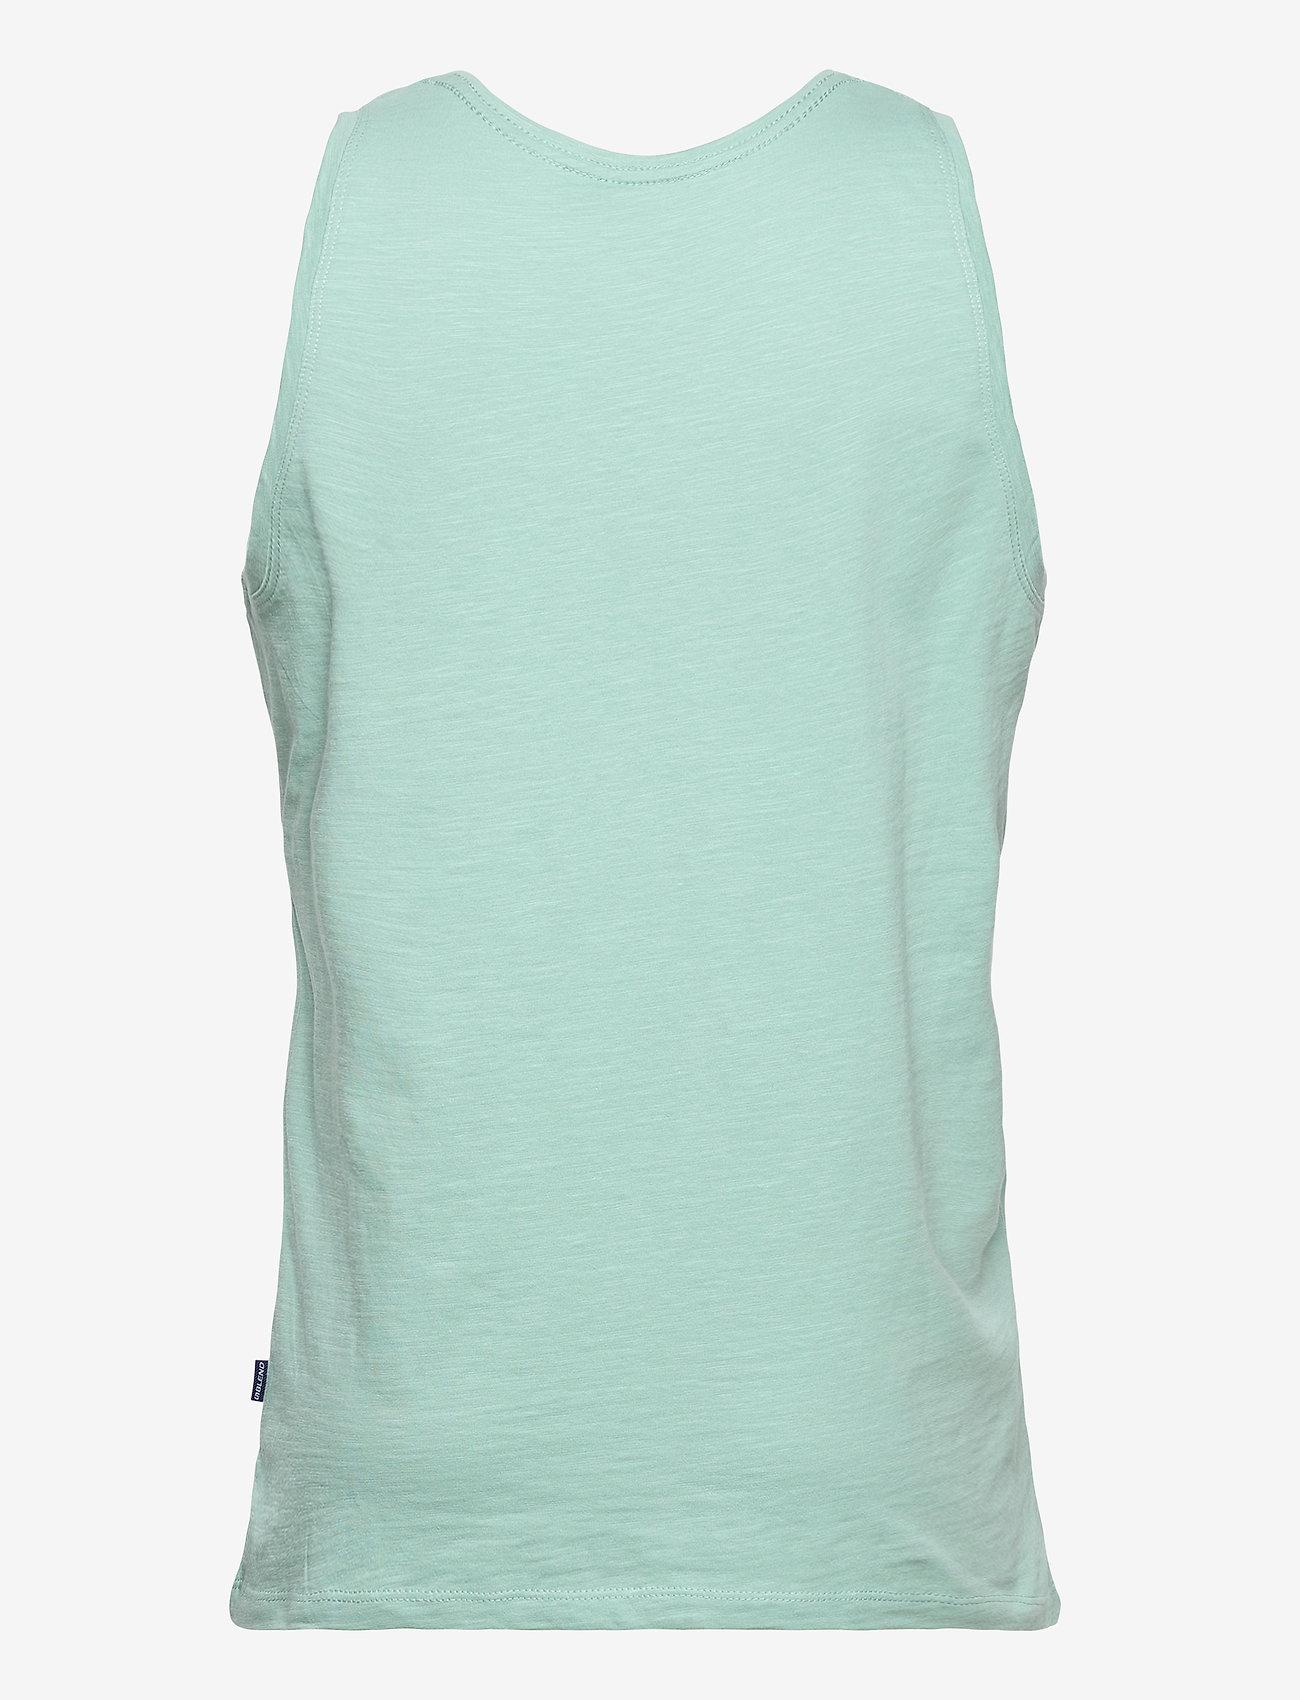 Blend - Tanktop - mouwenloze t-shirts - aquifer - 1